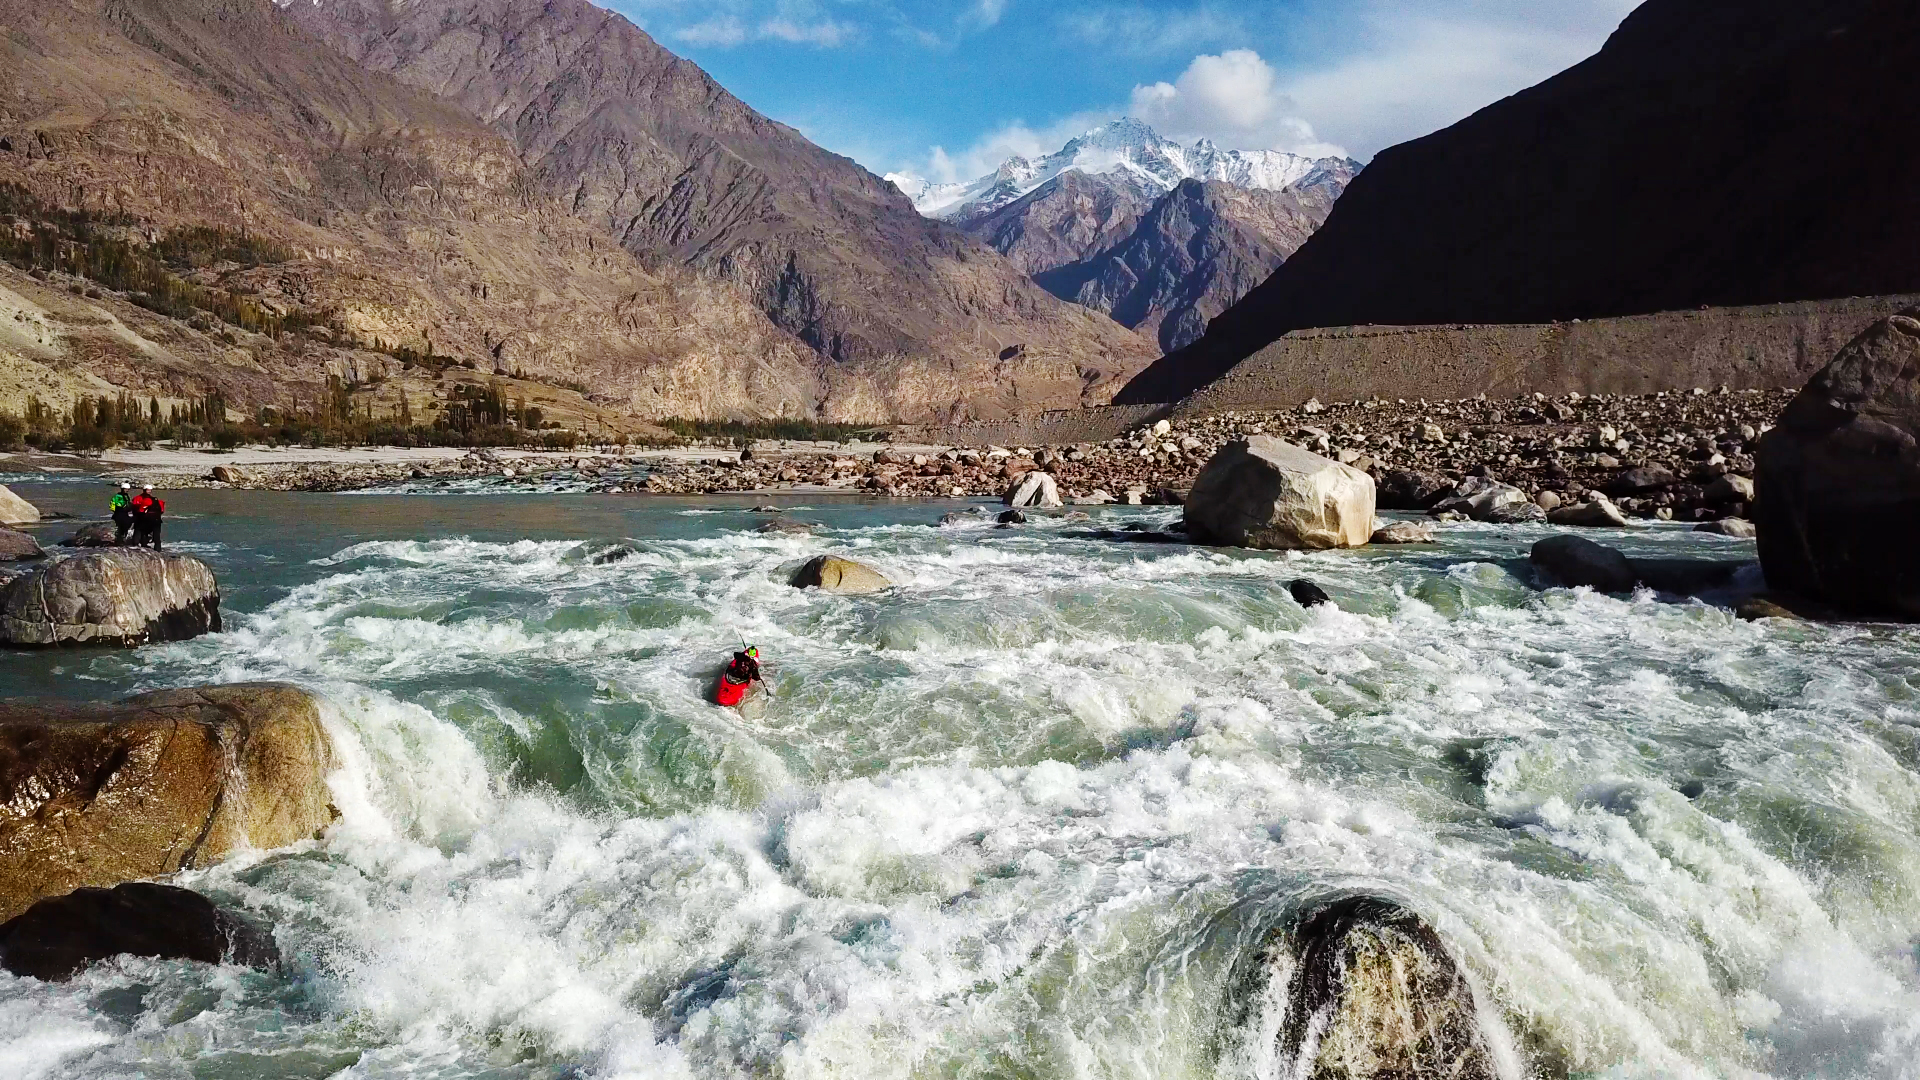 řeka Indus, Dag Sandvik